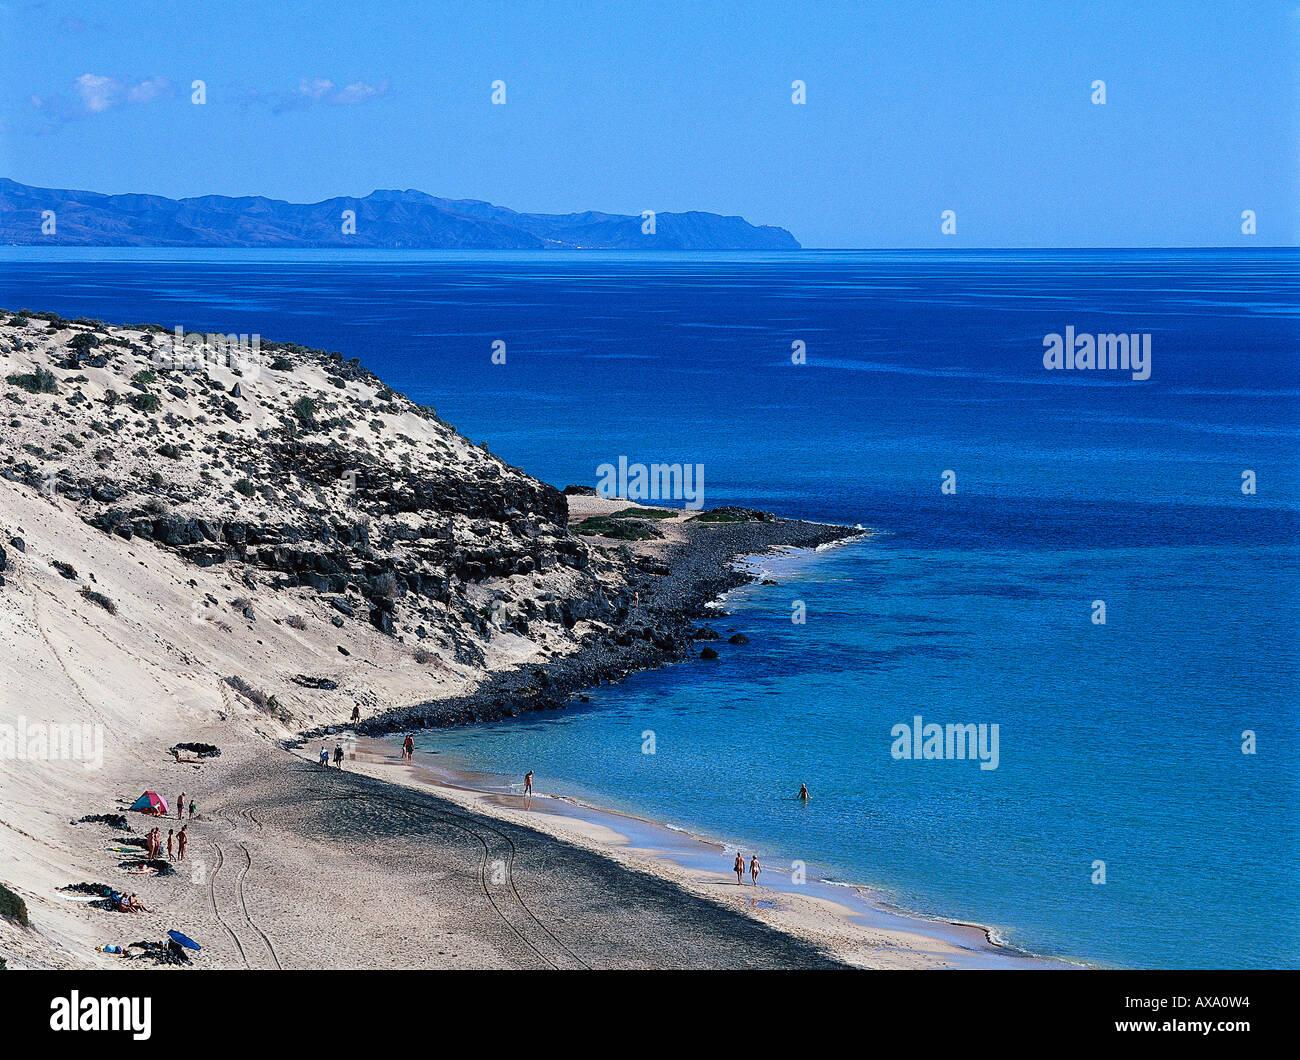 Playa Boca del Mal Nombre, Halbinsel Jandia, Fuerteventura Kanarische Inseln, Spanien Photo Stock